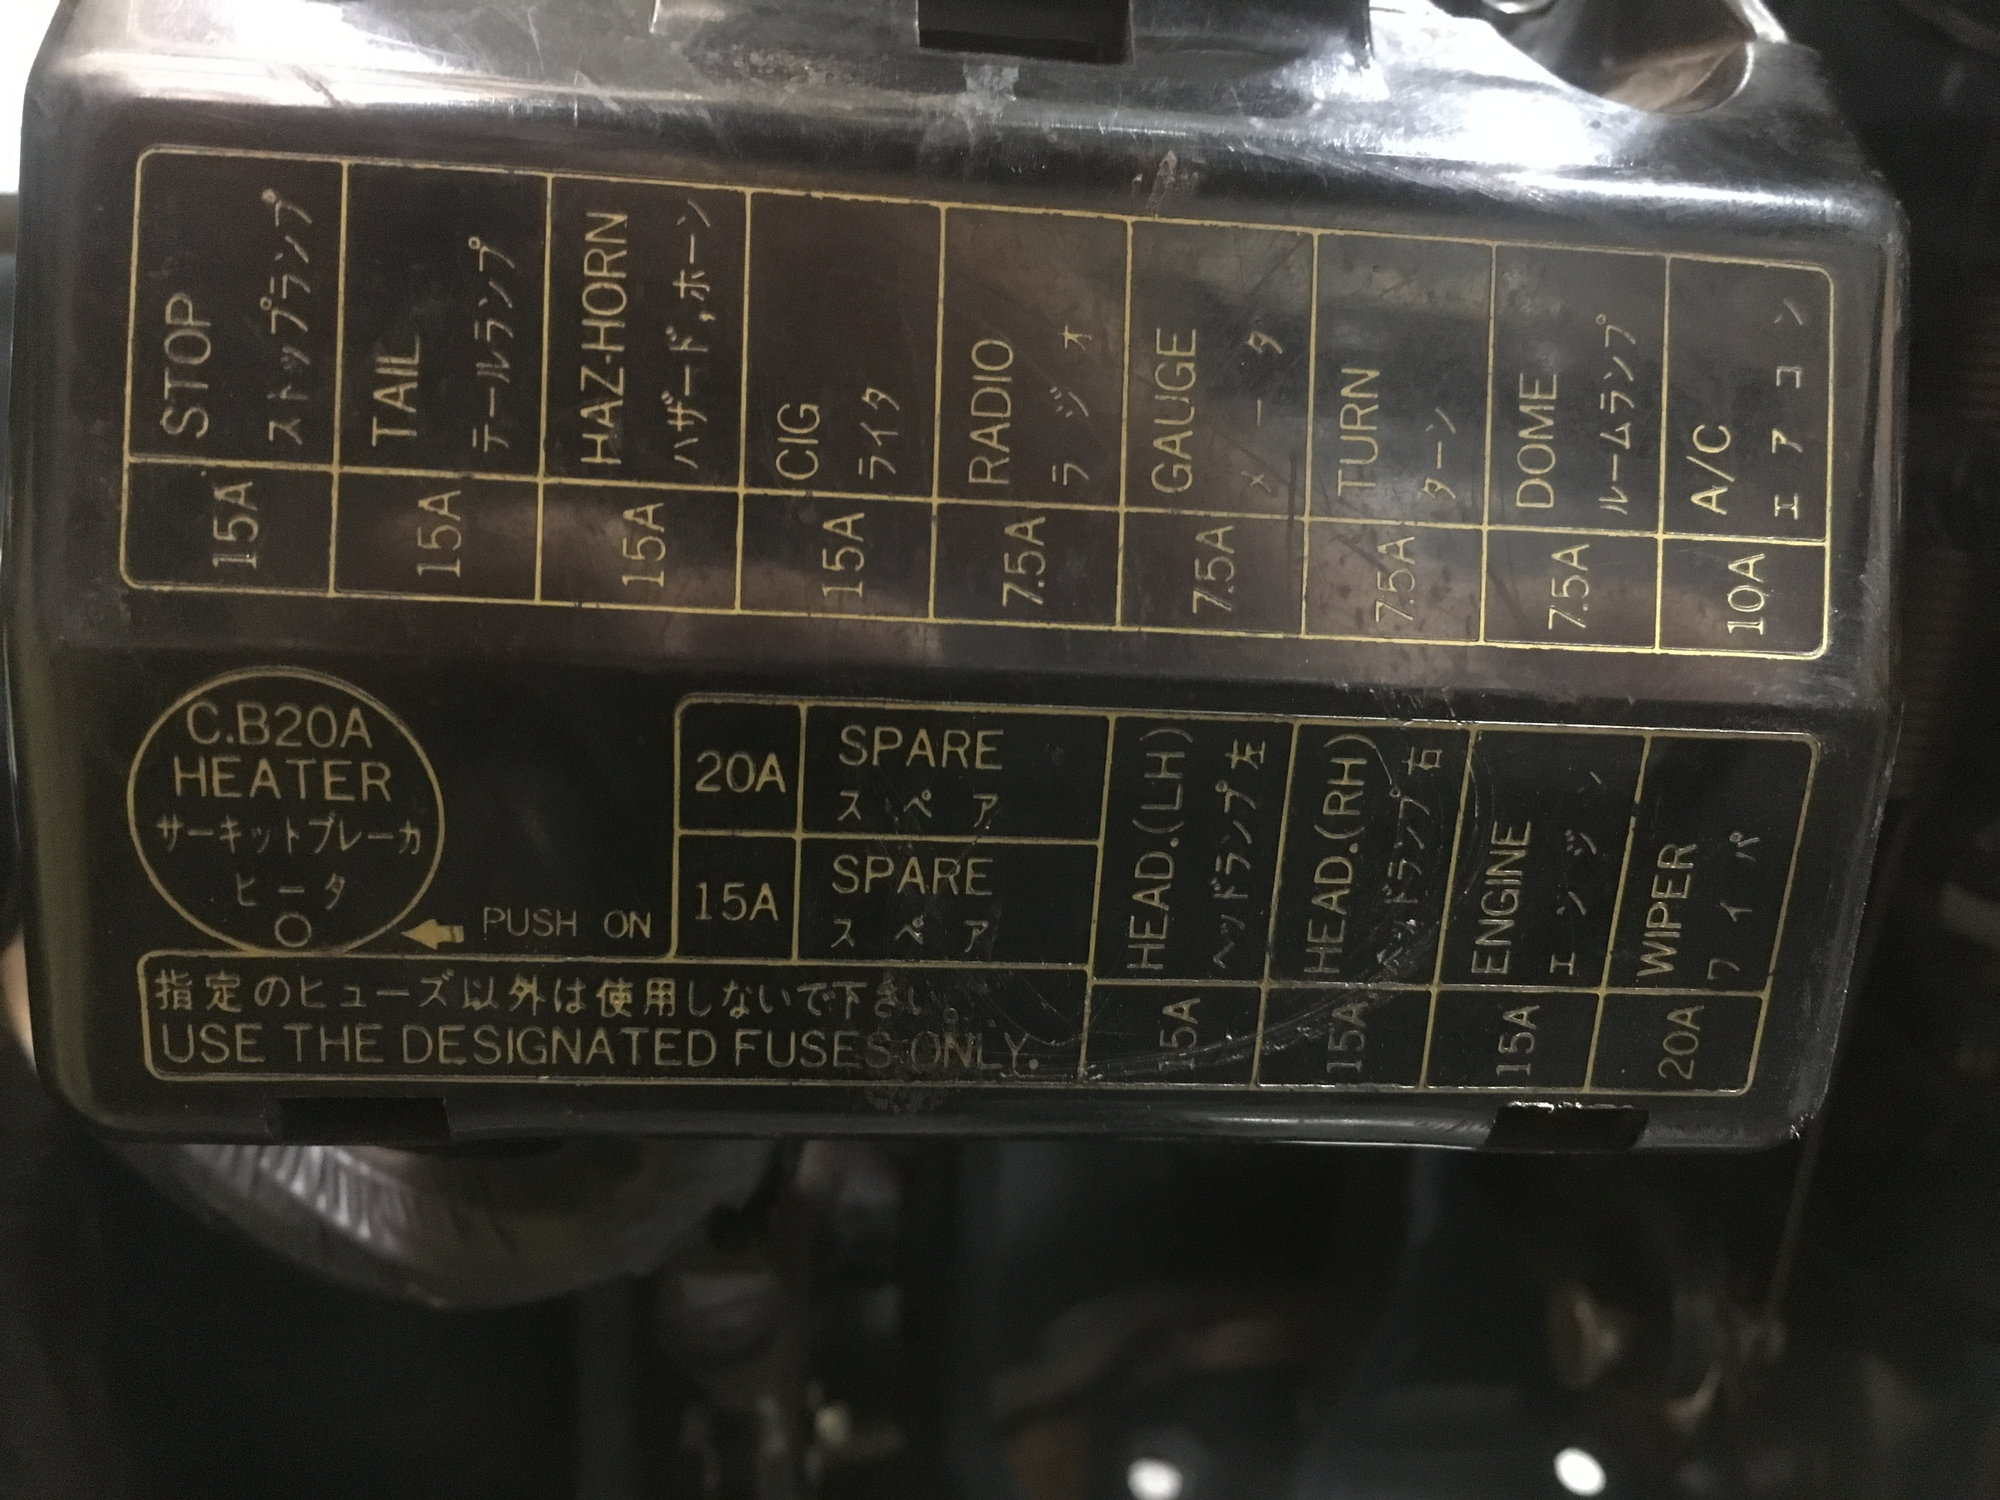 [DIAGRAM_38ZD]  1983 Pickup Fuse Panel Info Needed - YotaTech Forums | 1983 Toyota Pickup Fuse Box |  | YotaTech